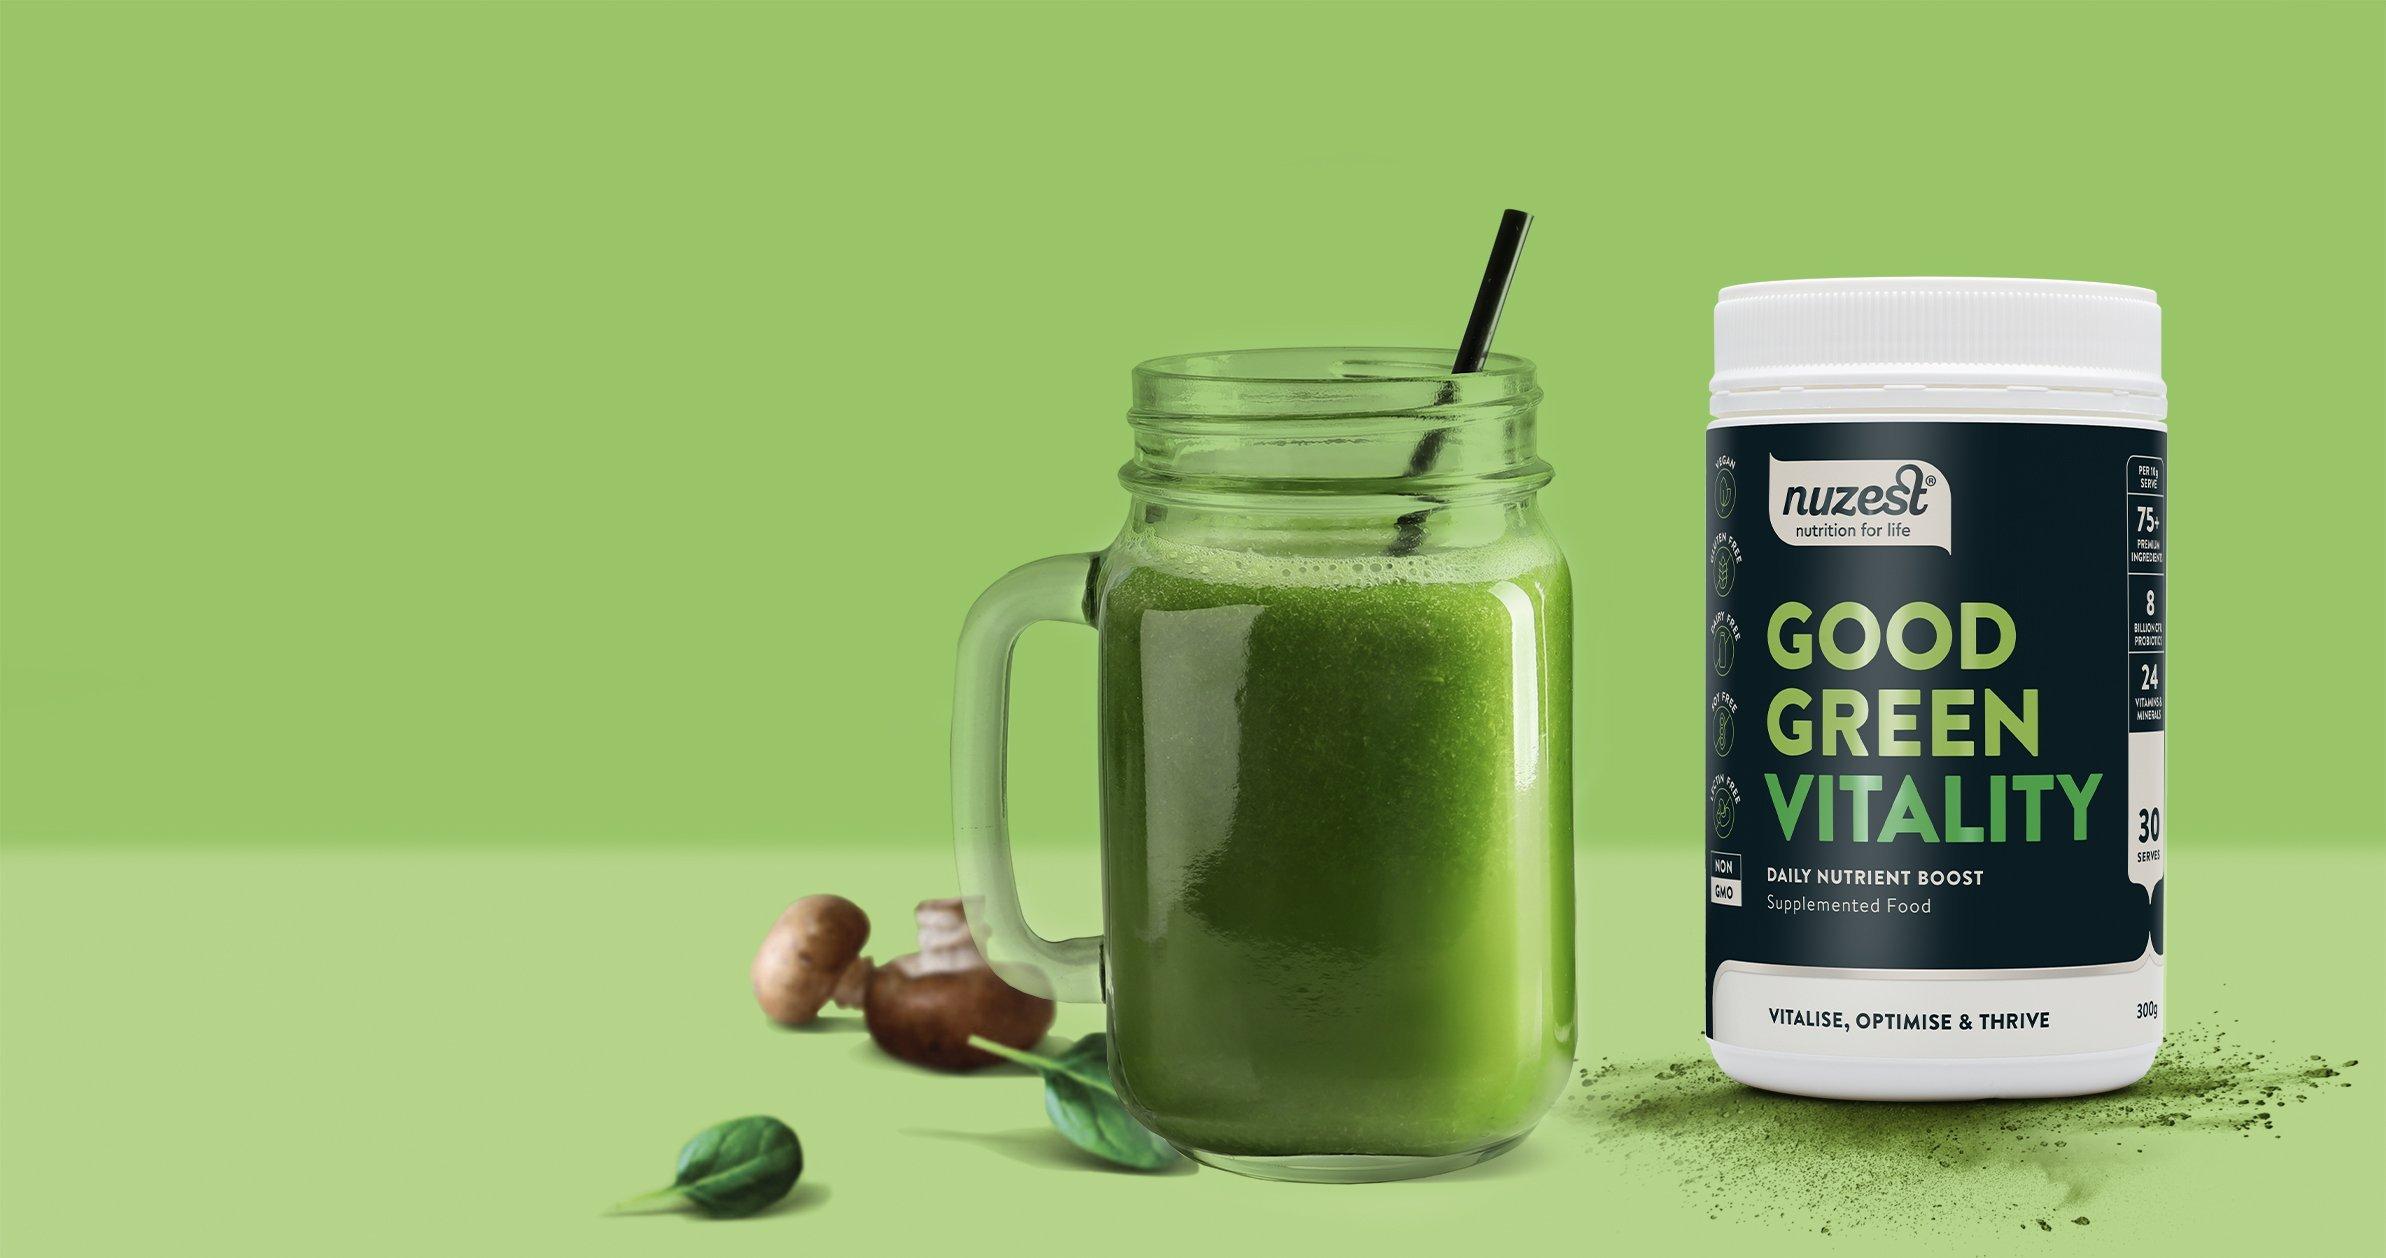 Good Green Vitality Trial Pack